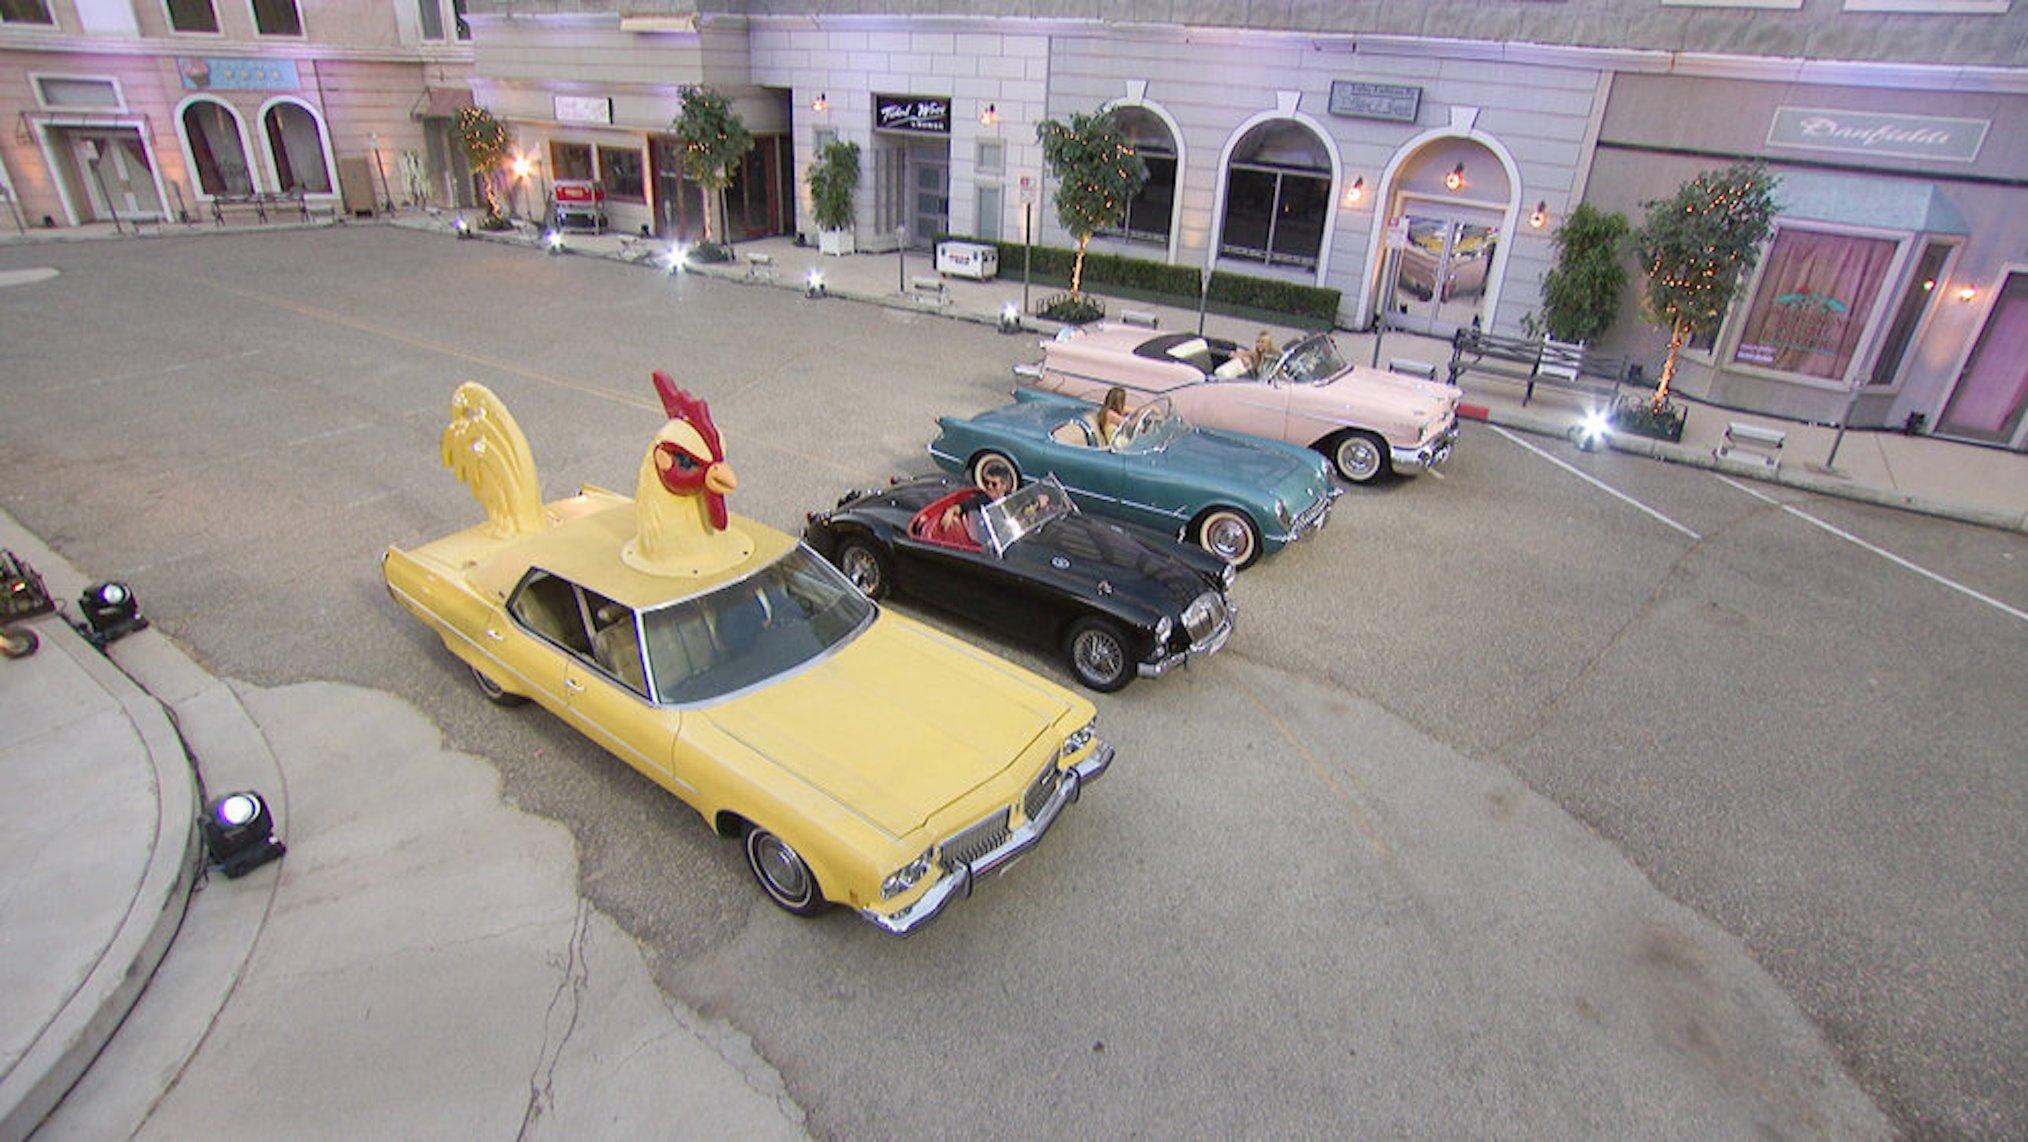 America's Got Talent Judge Cuts Cars